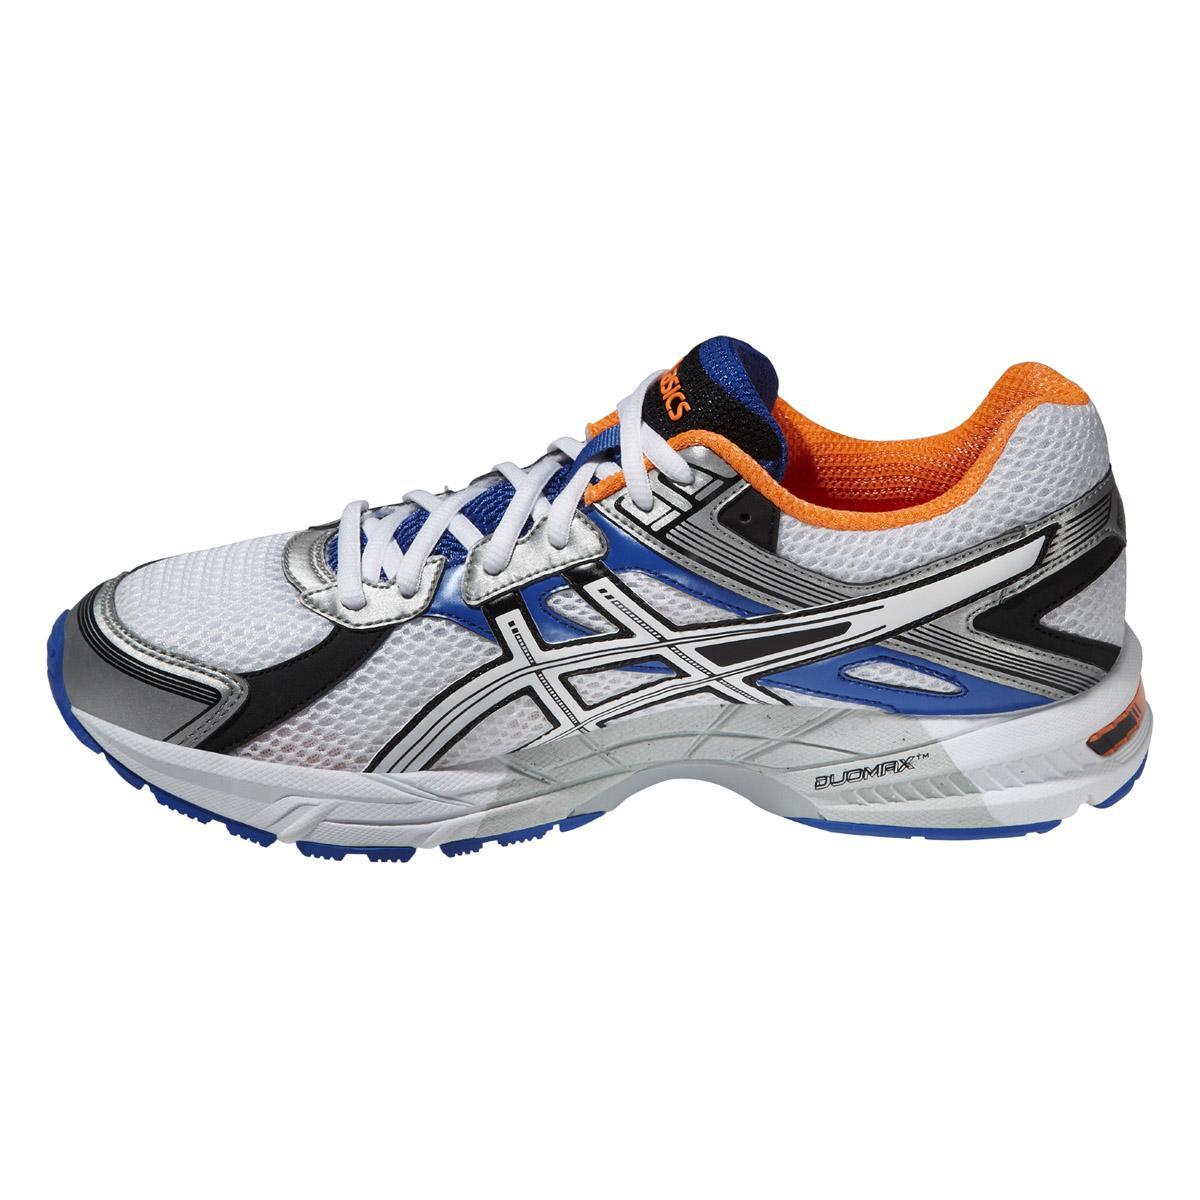 Asics Mens GEL-Trounce 2 Running Shoes - White/Blue